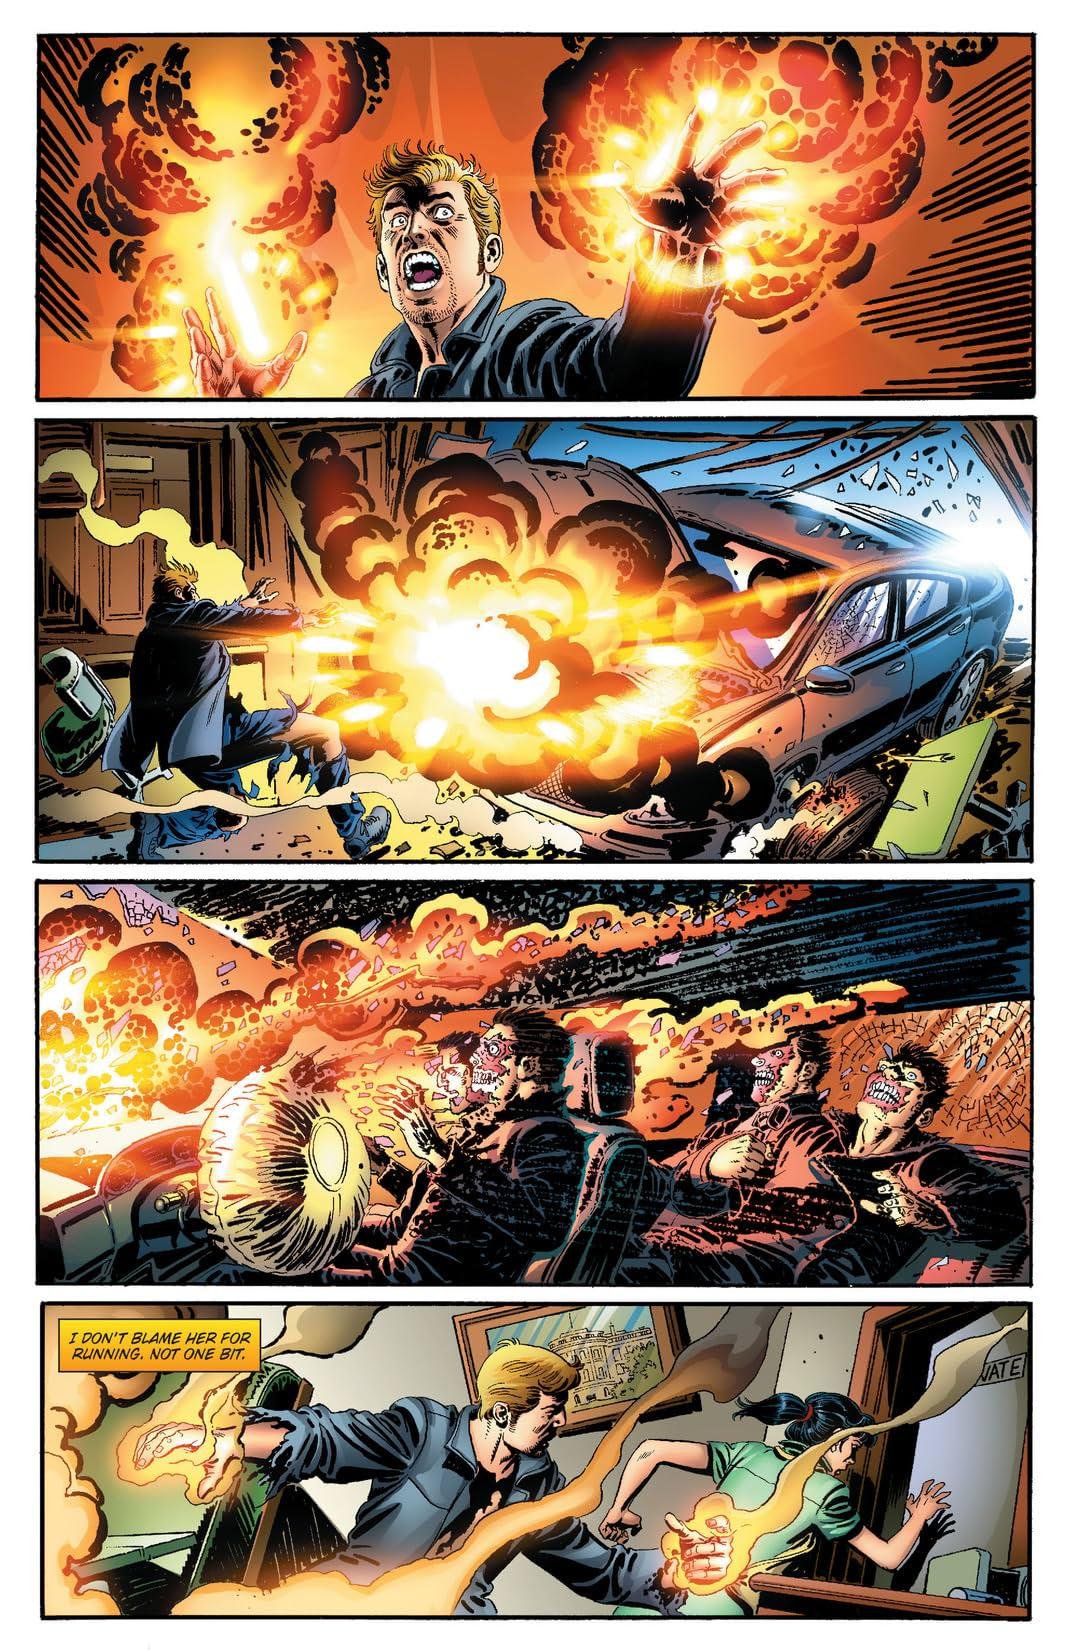 Human Bomb (2012) #2 (of 4)